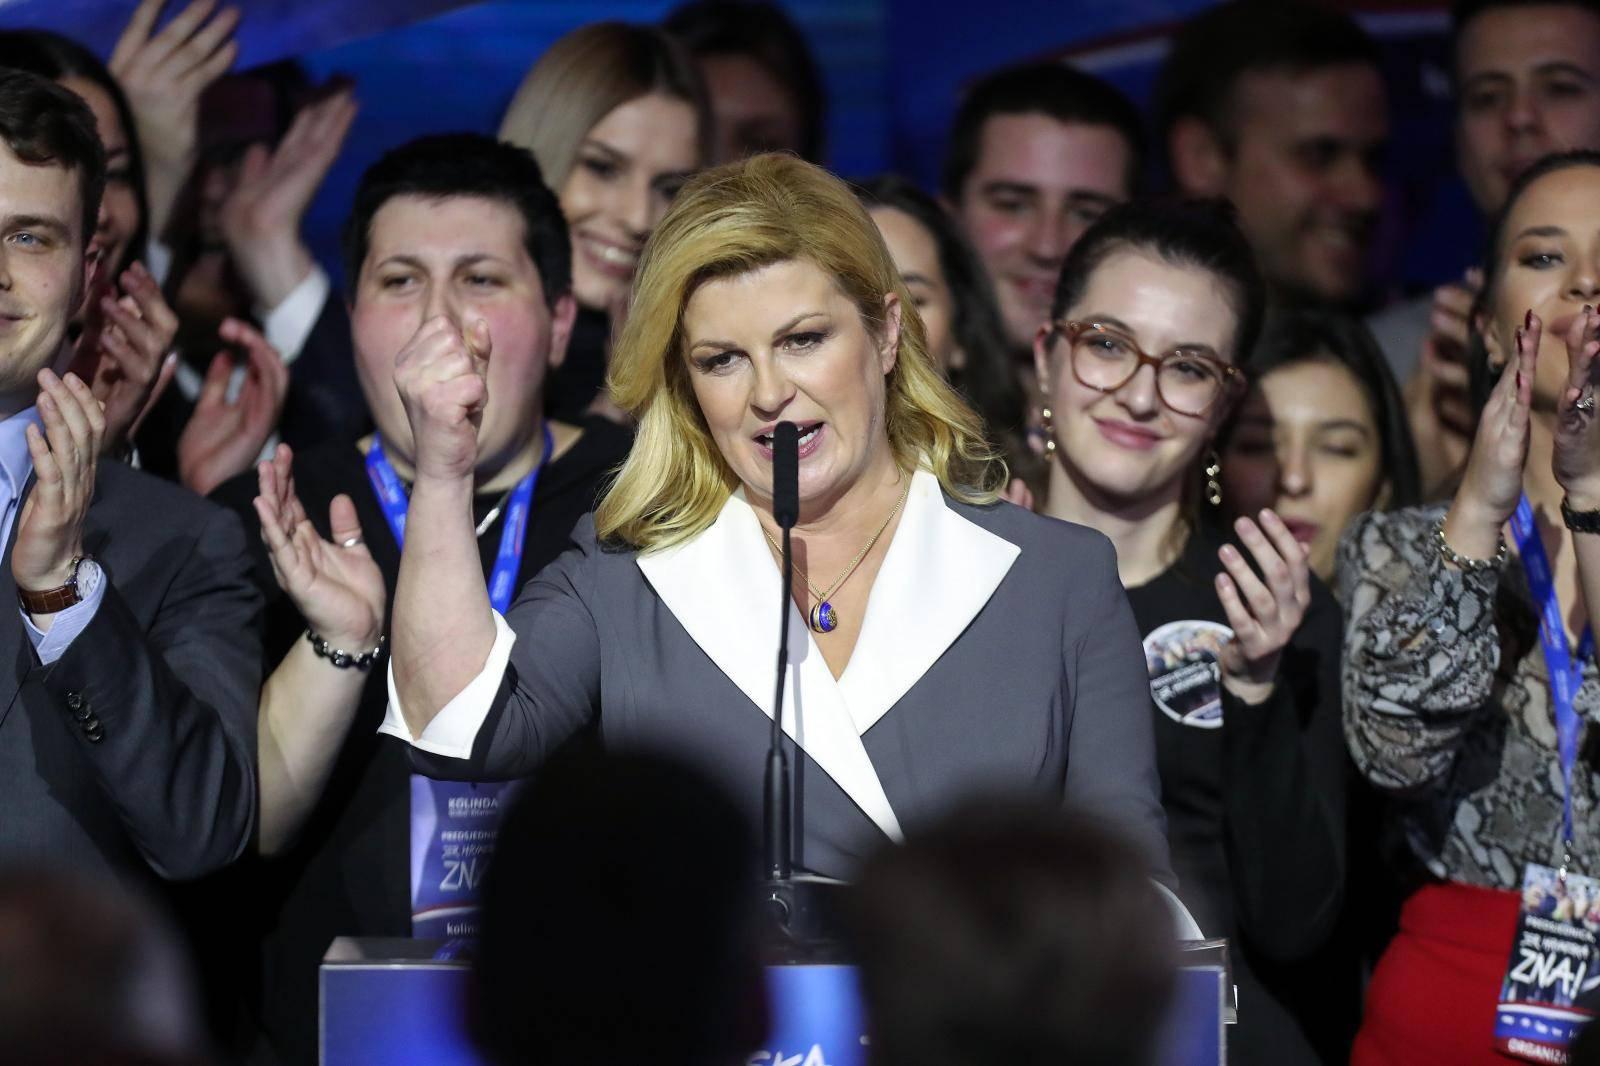 Zagreb: Izborni stožer Kolinde Grabar-Kitarović